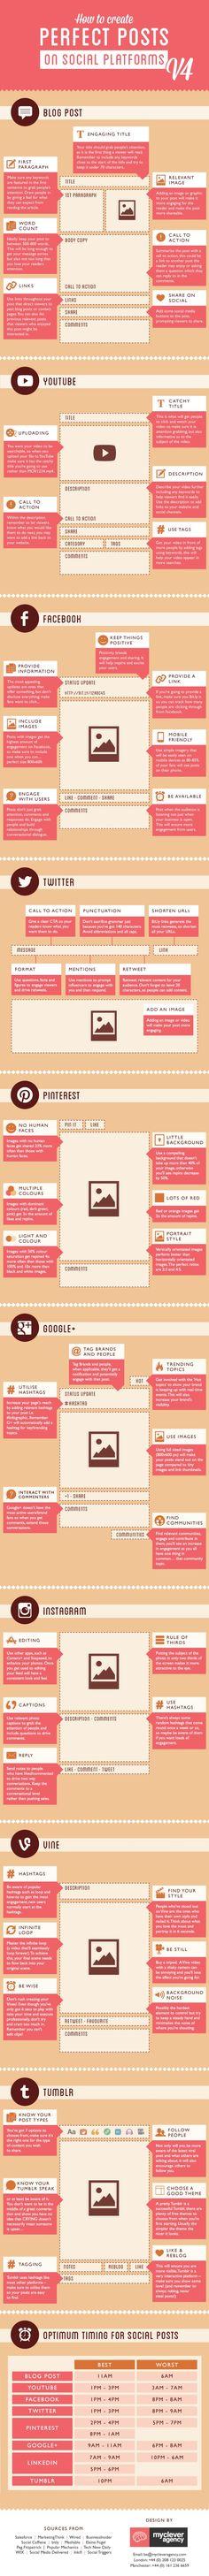 The Art of Creating Perfect Social Media Posts - infographic | #TheMarketingTechAlert